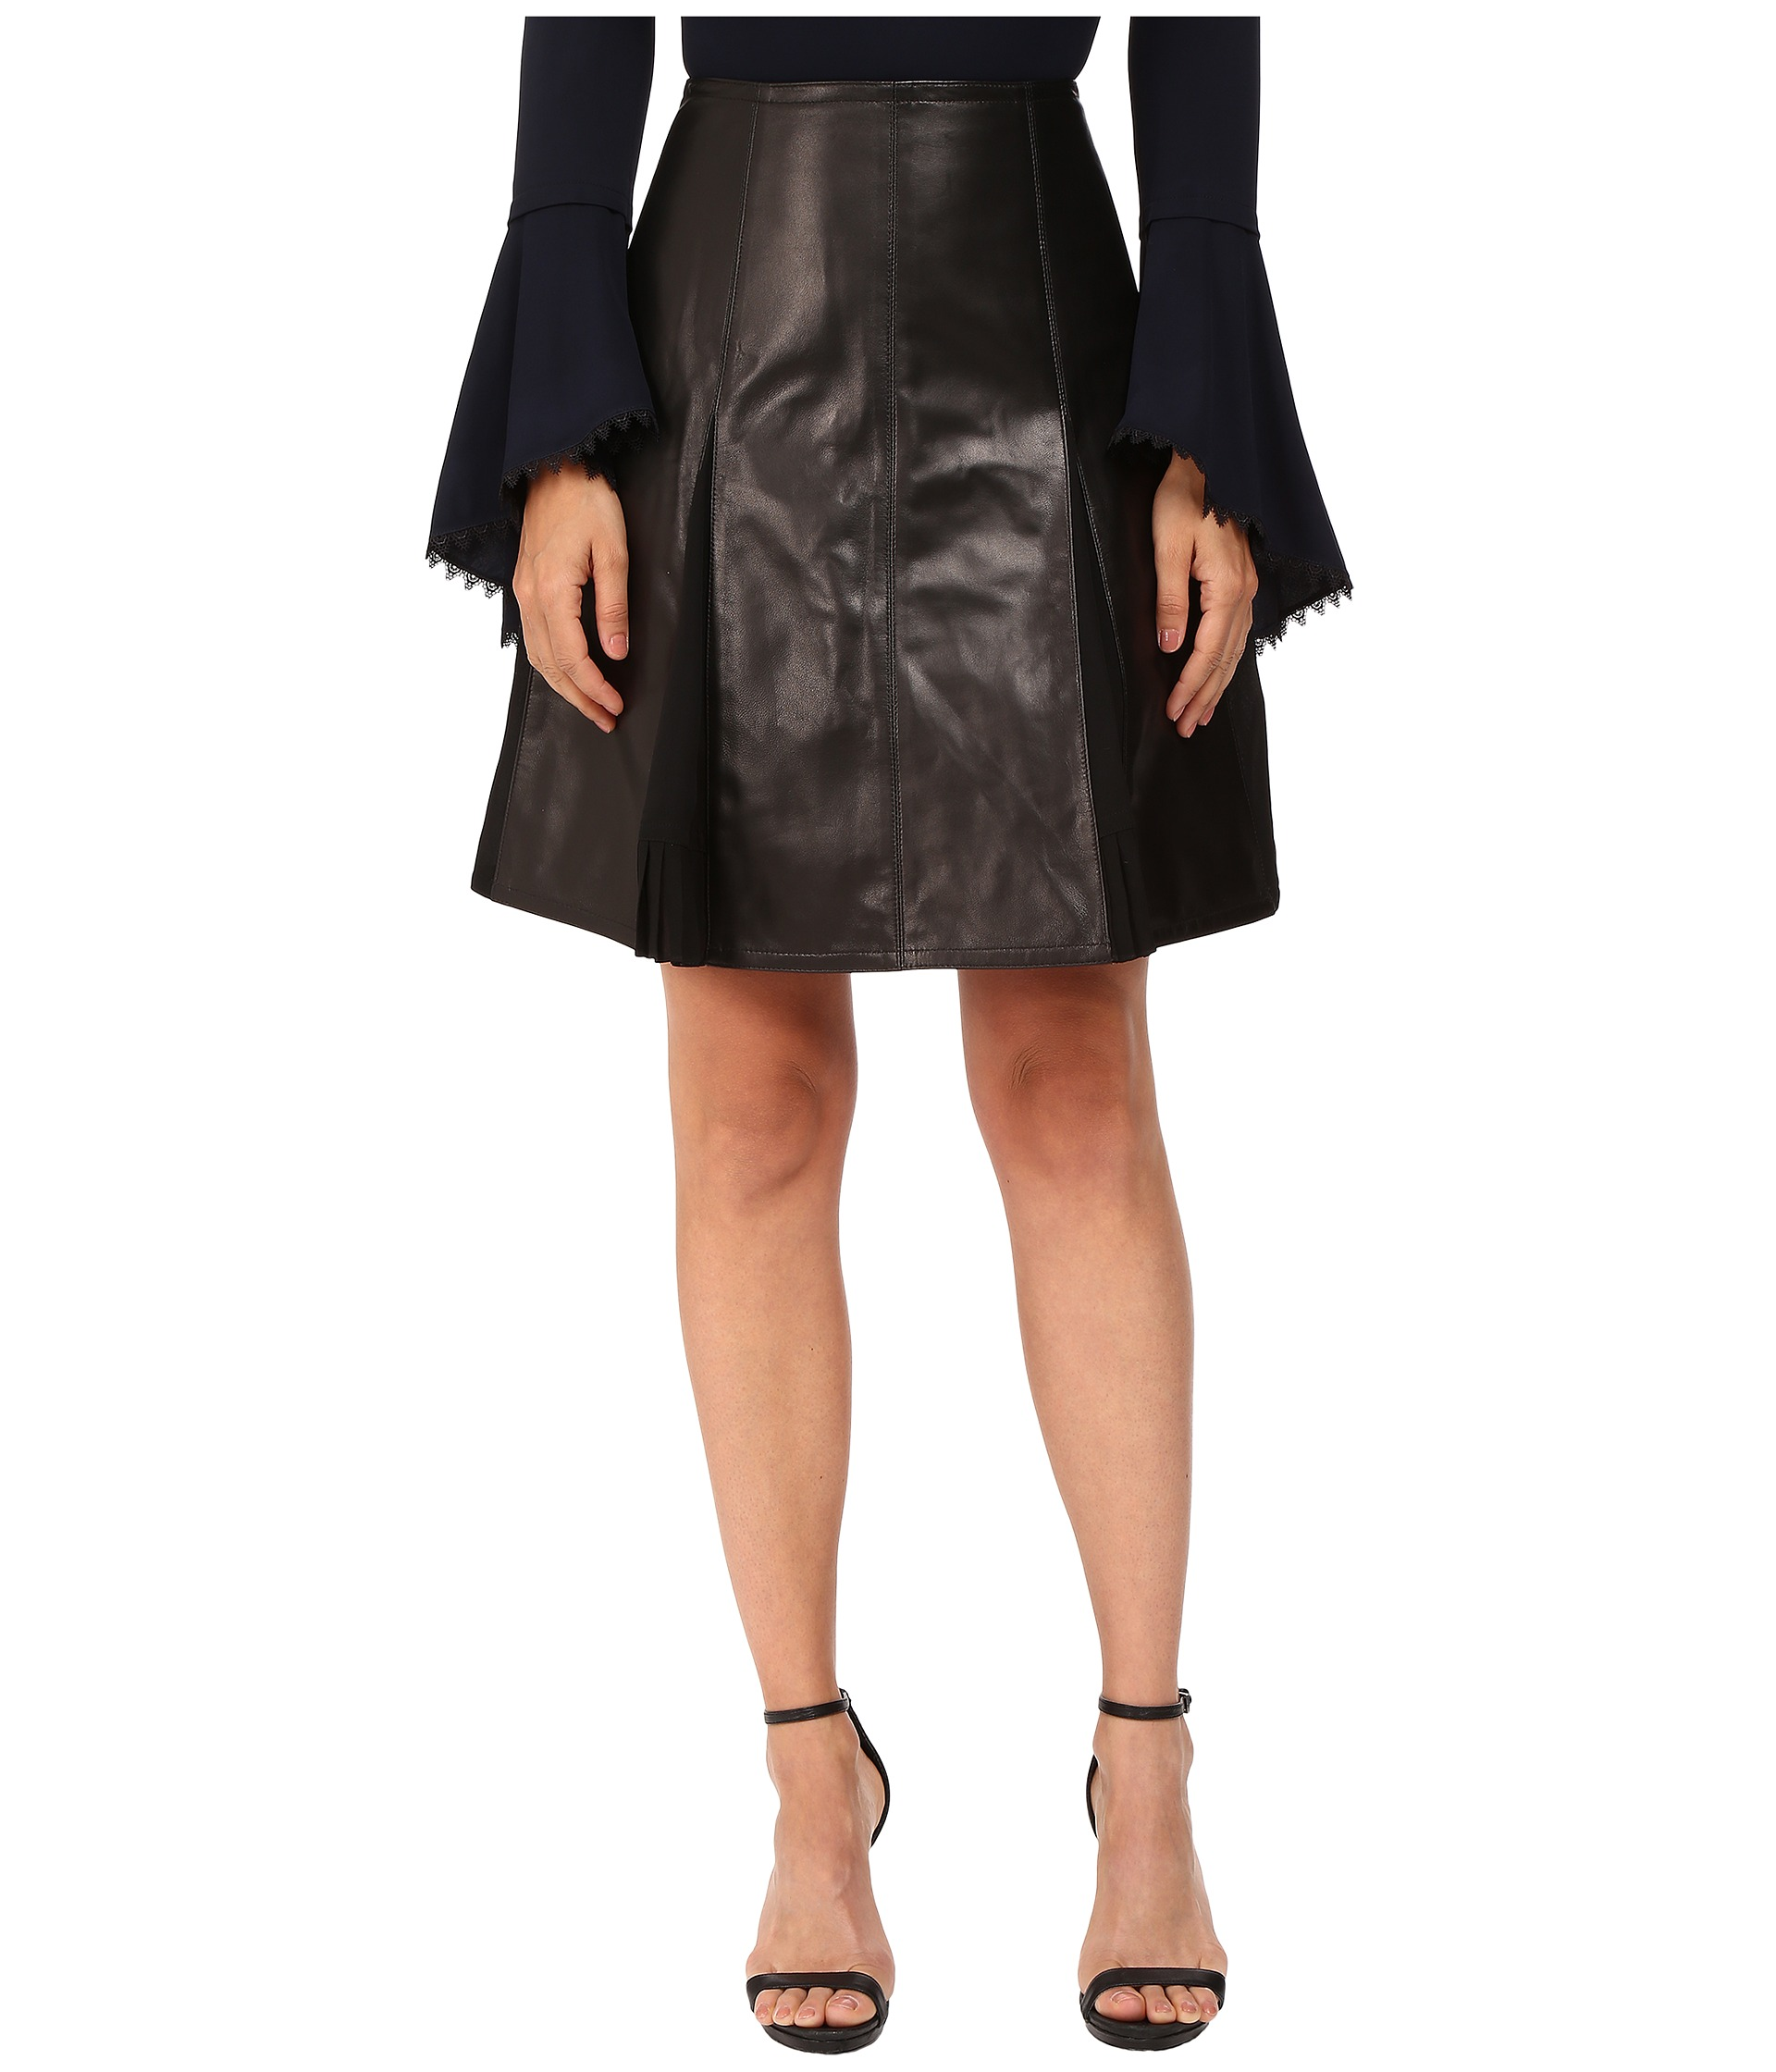 Flair Skirt 45